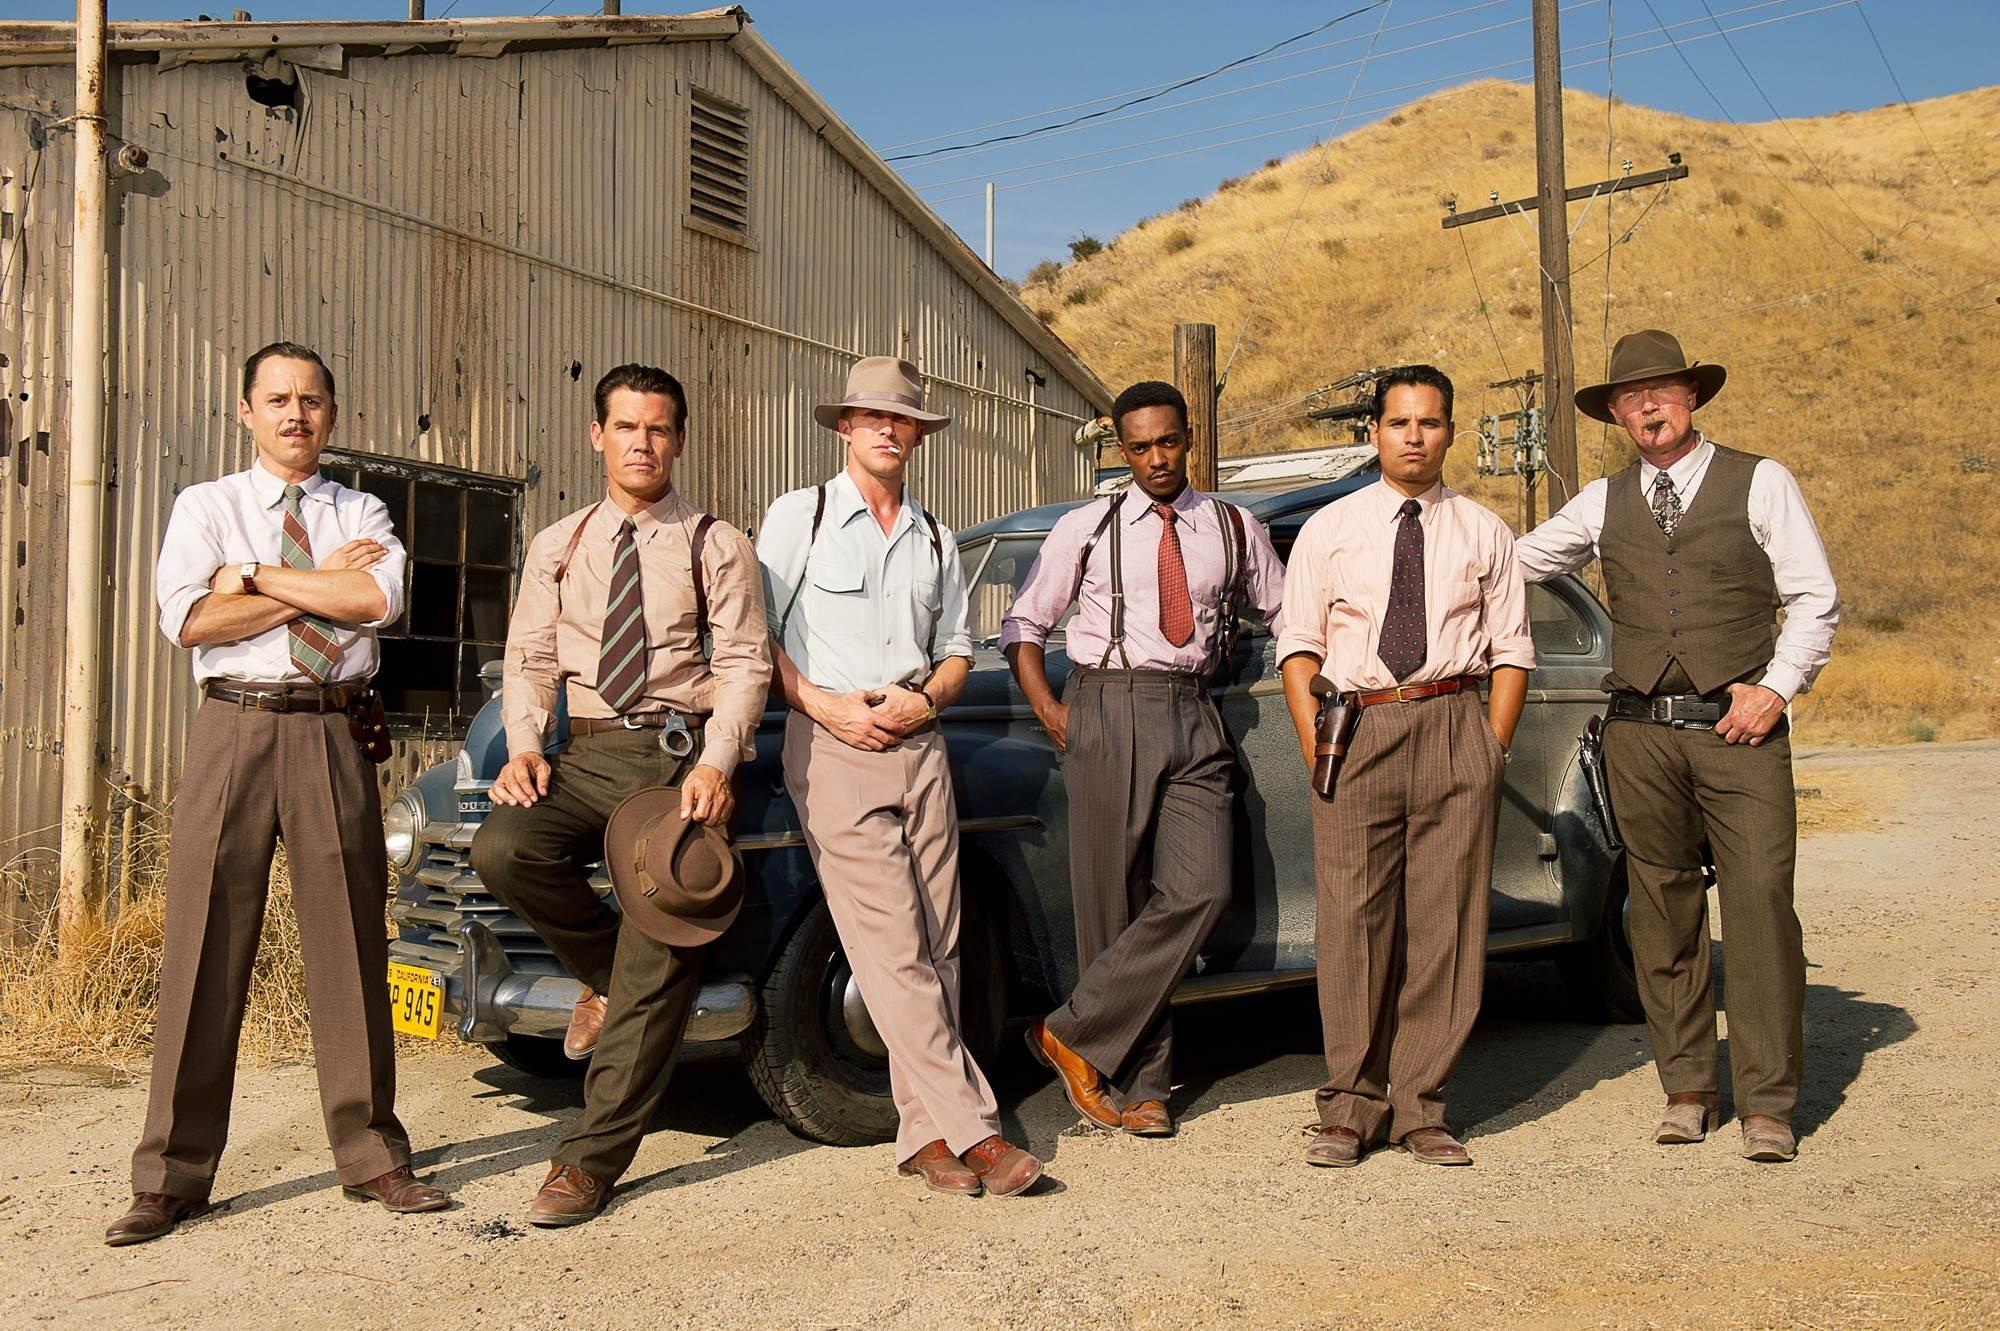 gangster-squad-08.jpg